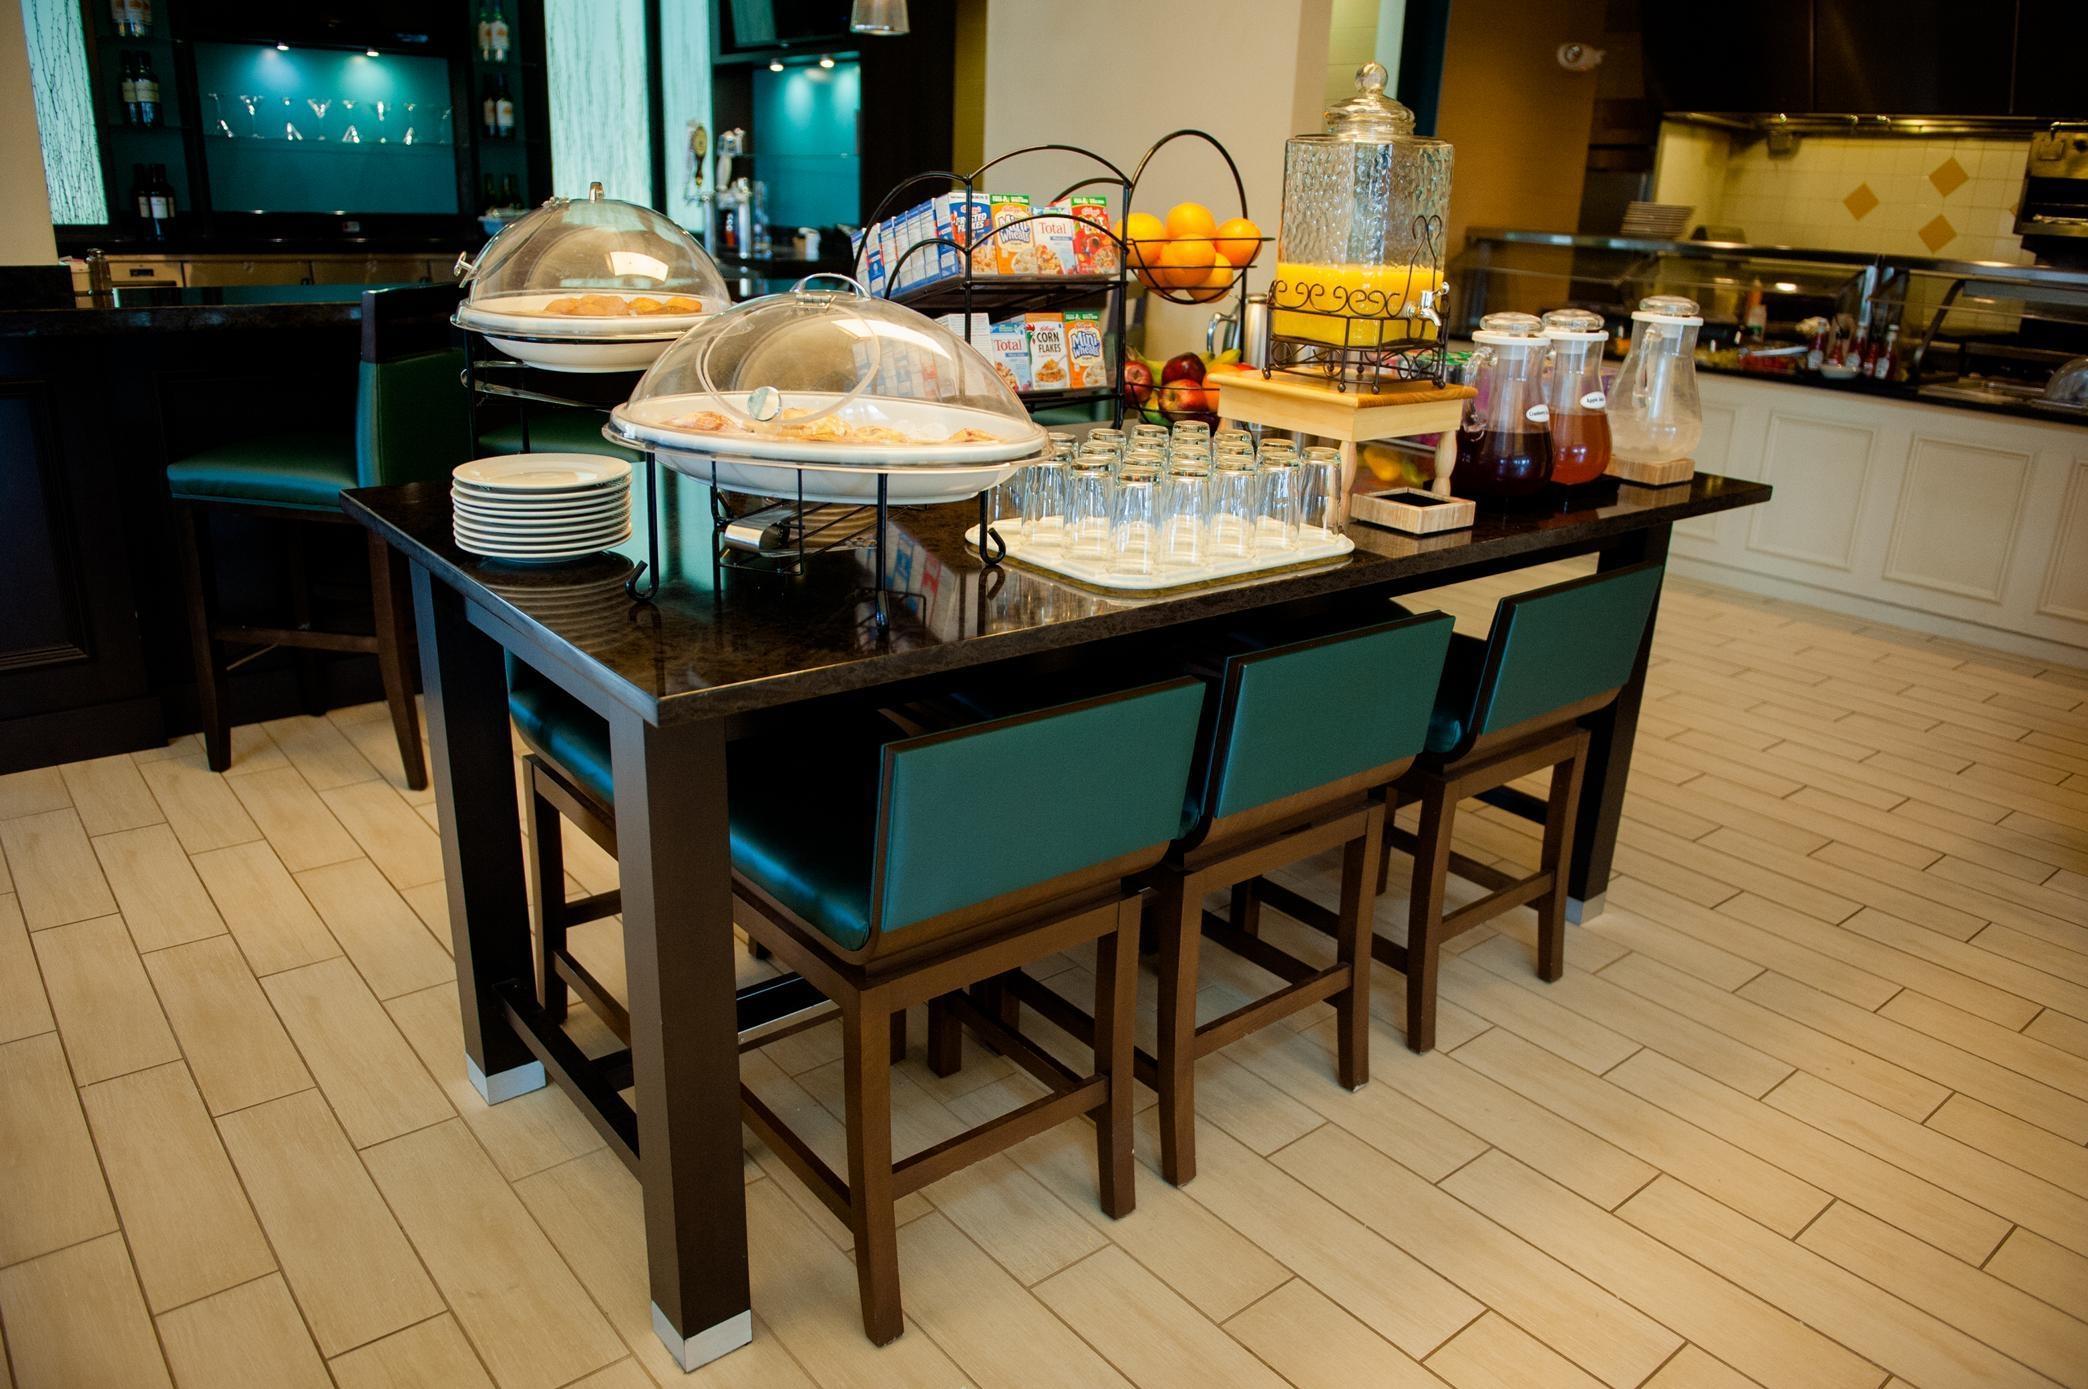 Hilton Garden Inn Rockaway image 4